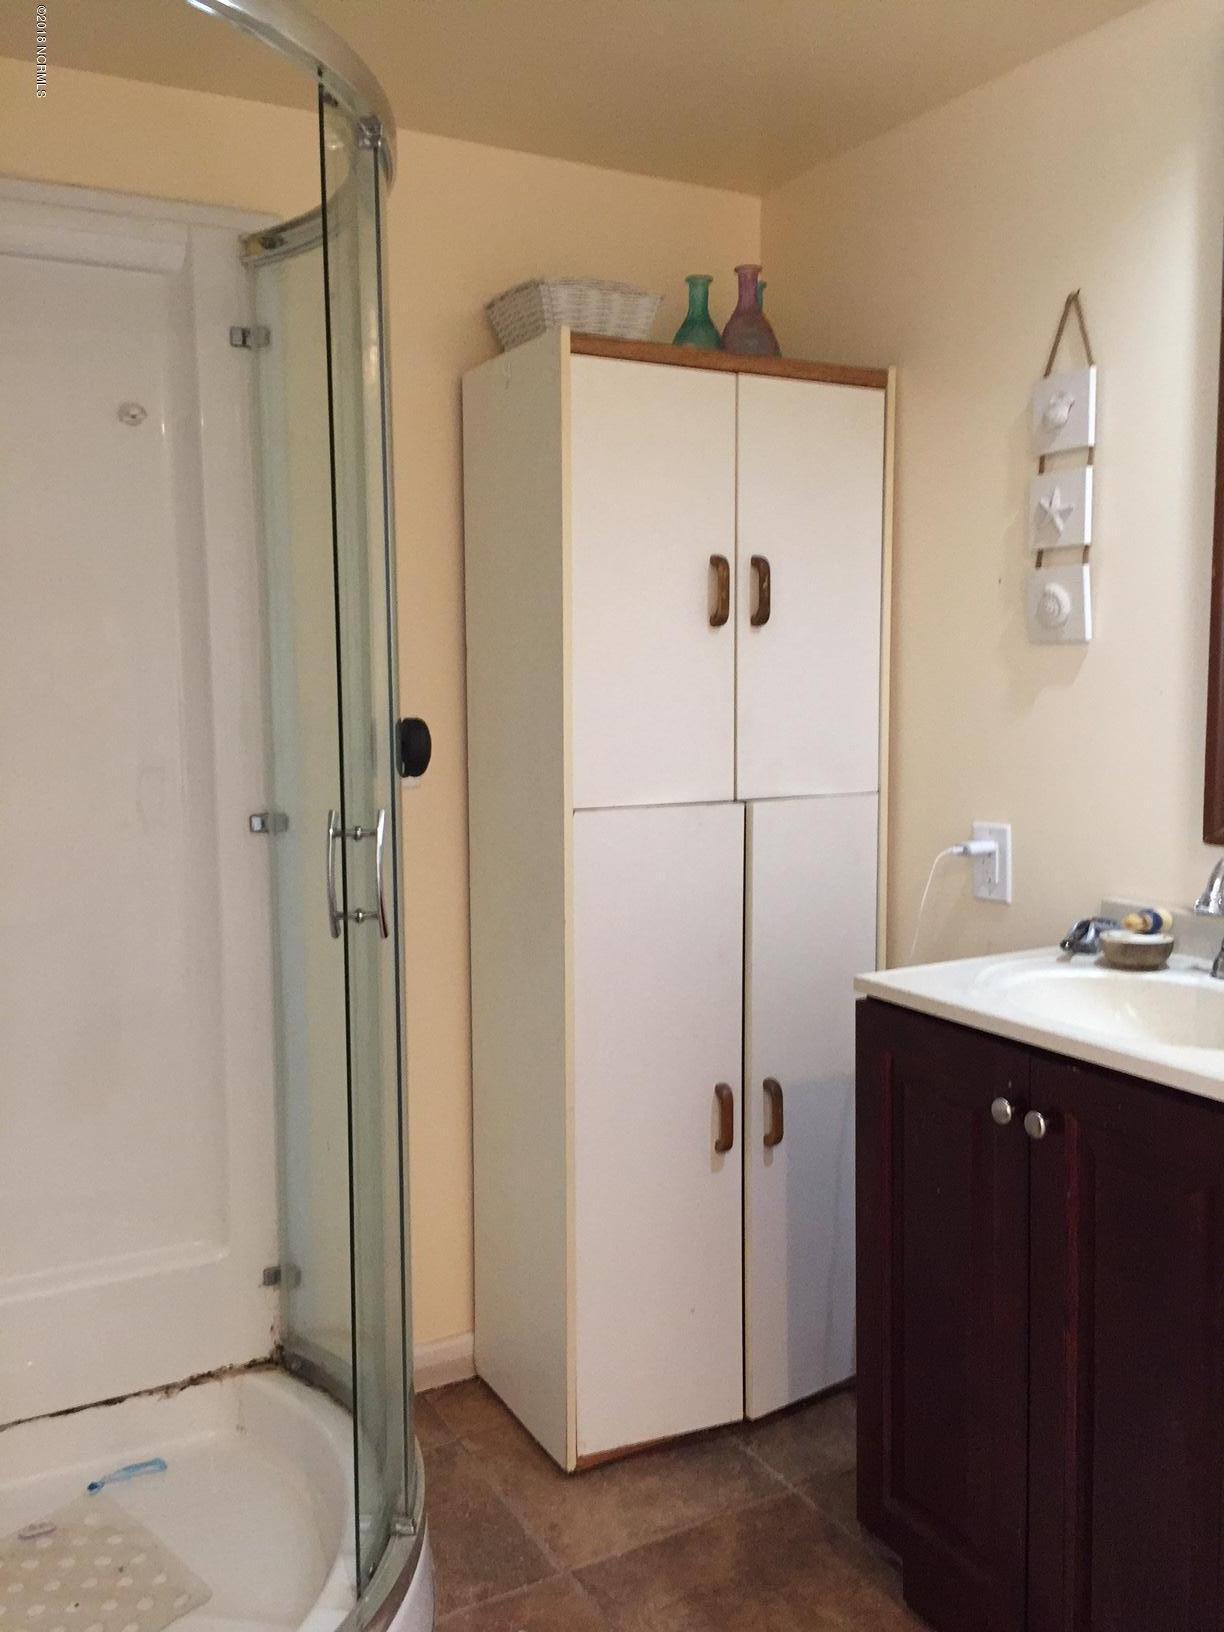 2184 Seashore Road, Supply, North Carolina, 1 Bedroom Bedrooms, 4 Rooms Rooms,1 BathroomBathrooms,Single family residence,For sale,Seashore,100102679